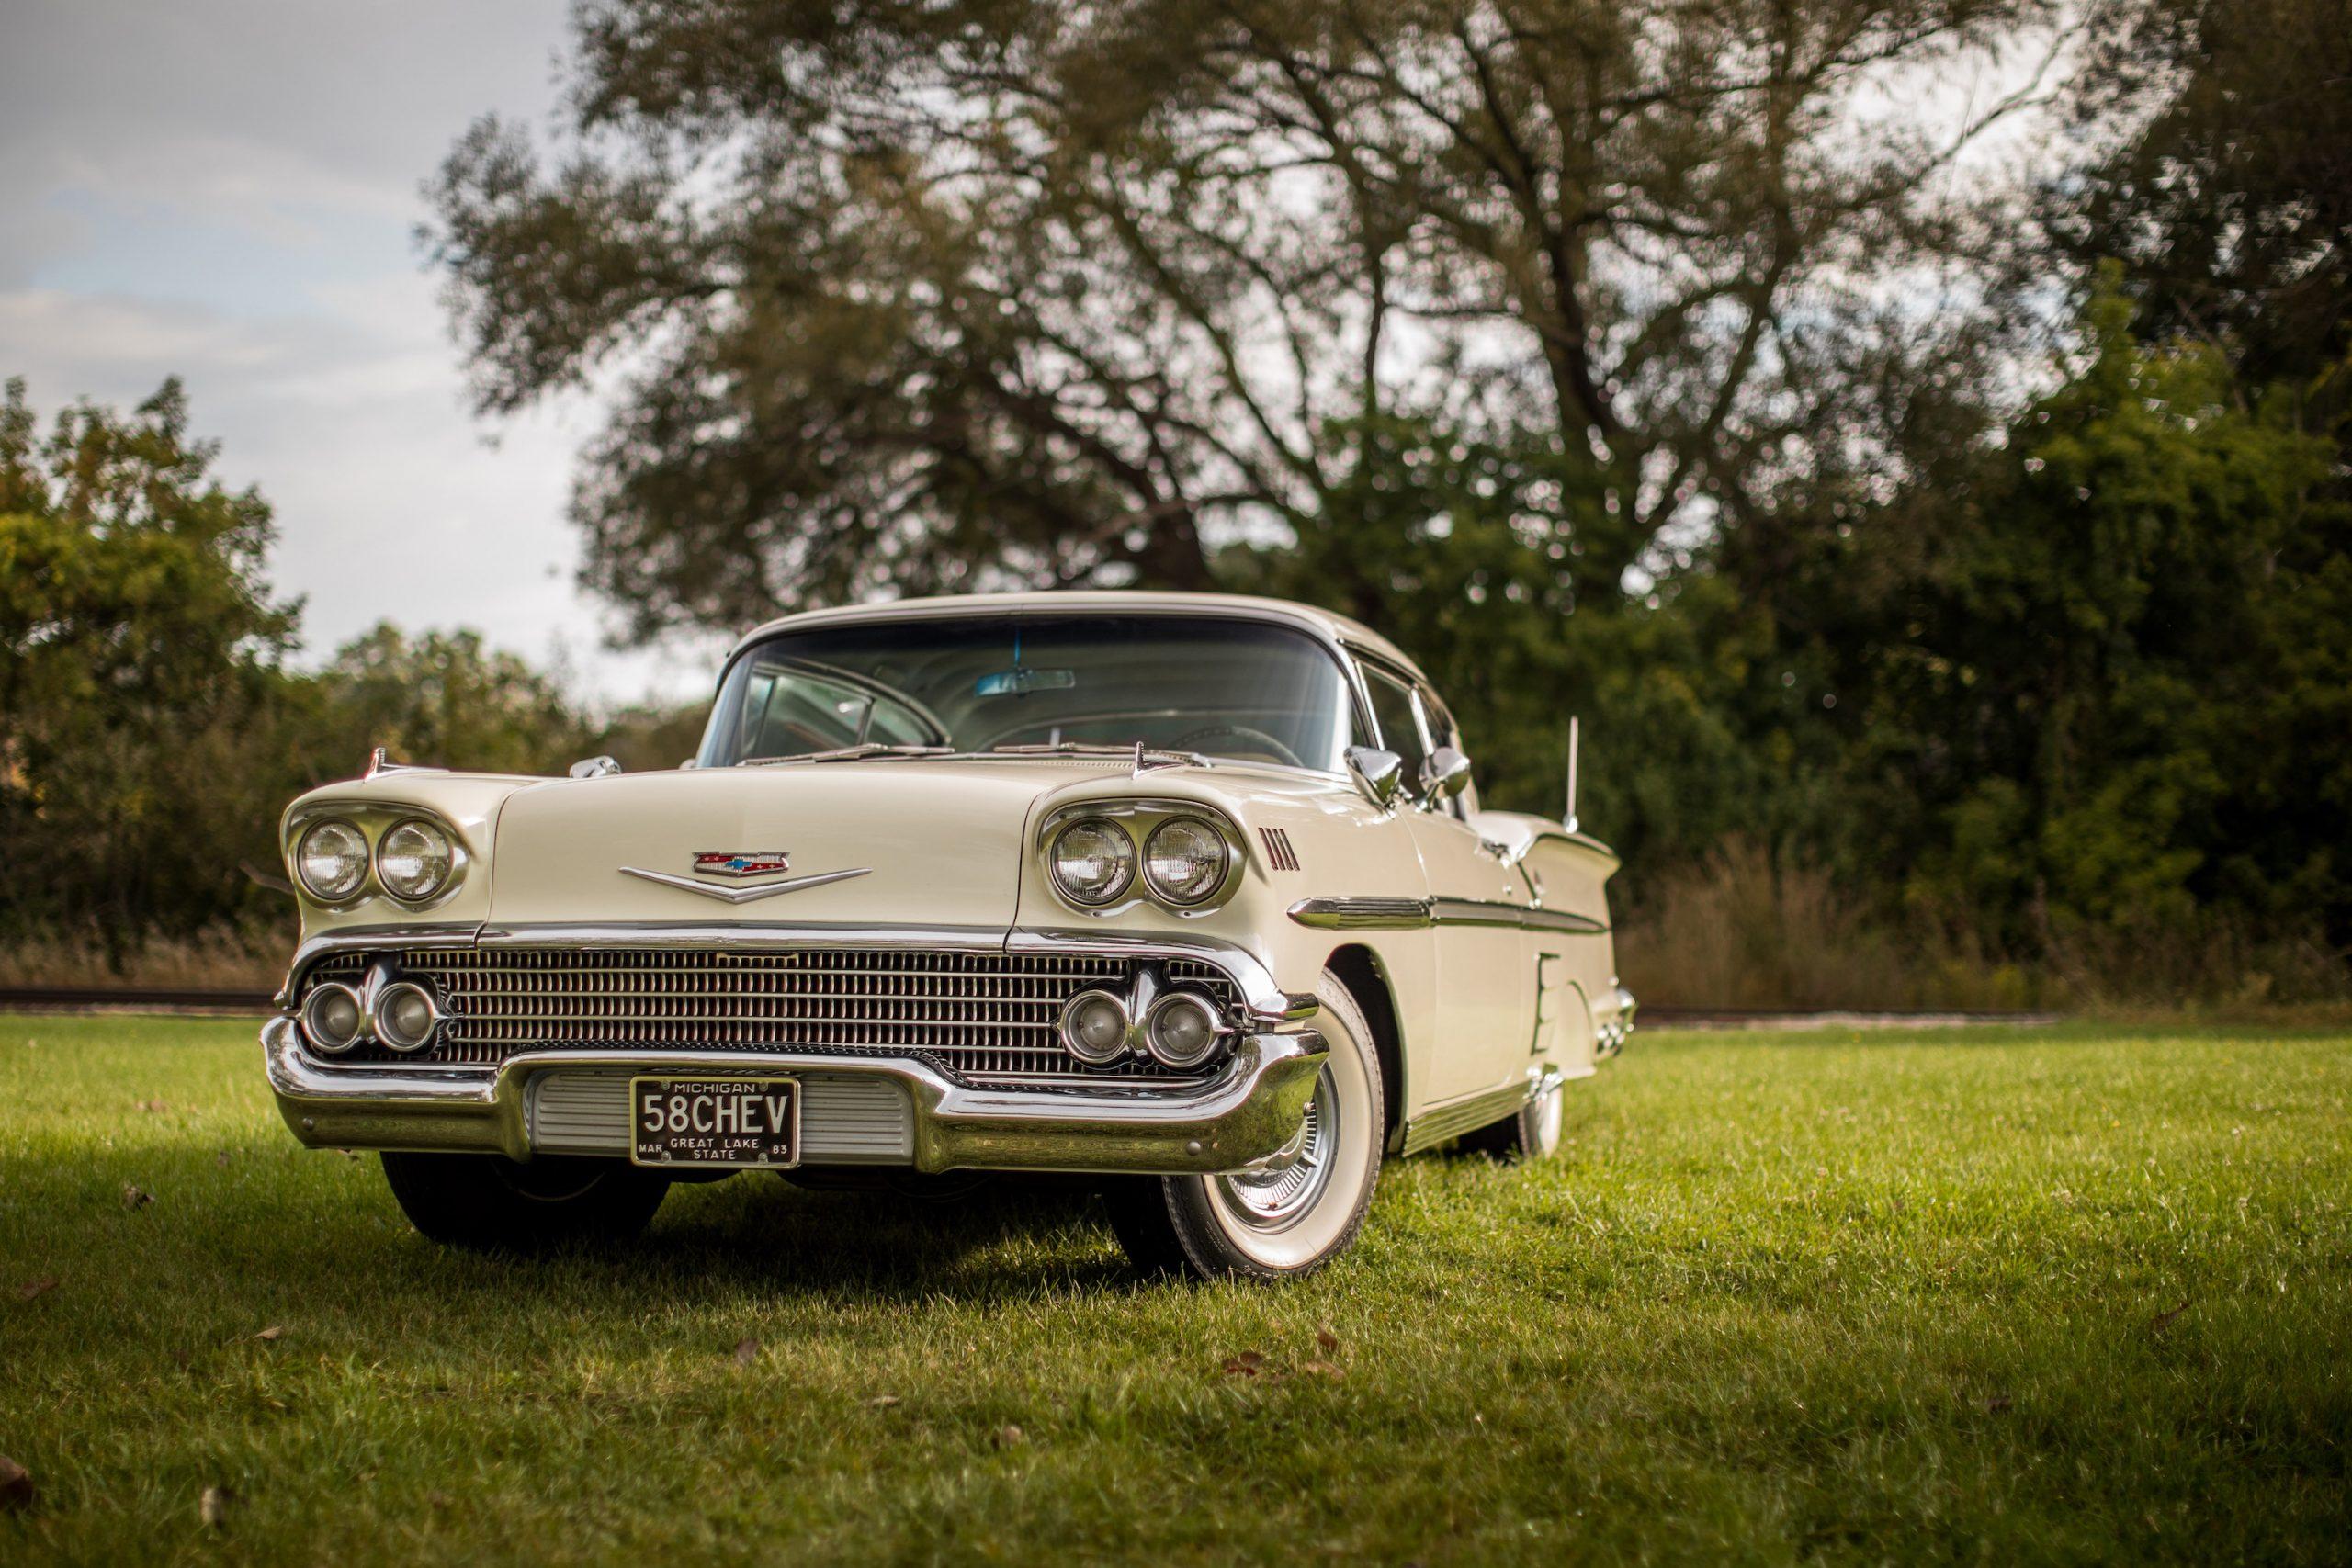 1958 Chevrolet Impala Hardtop Front Three-Quarter